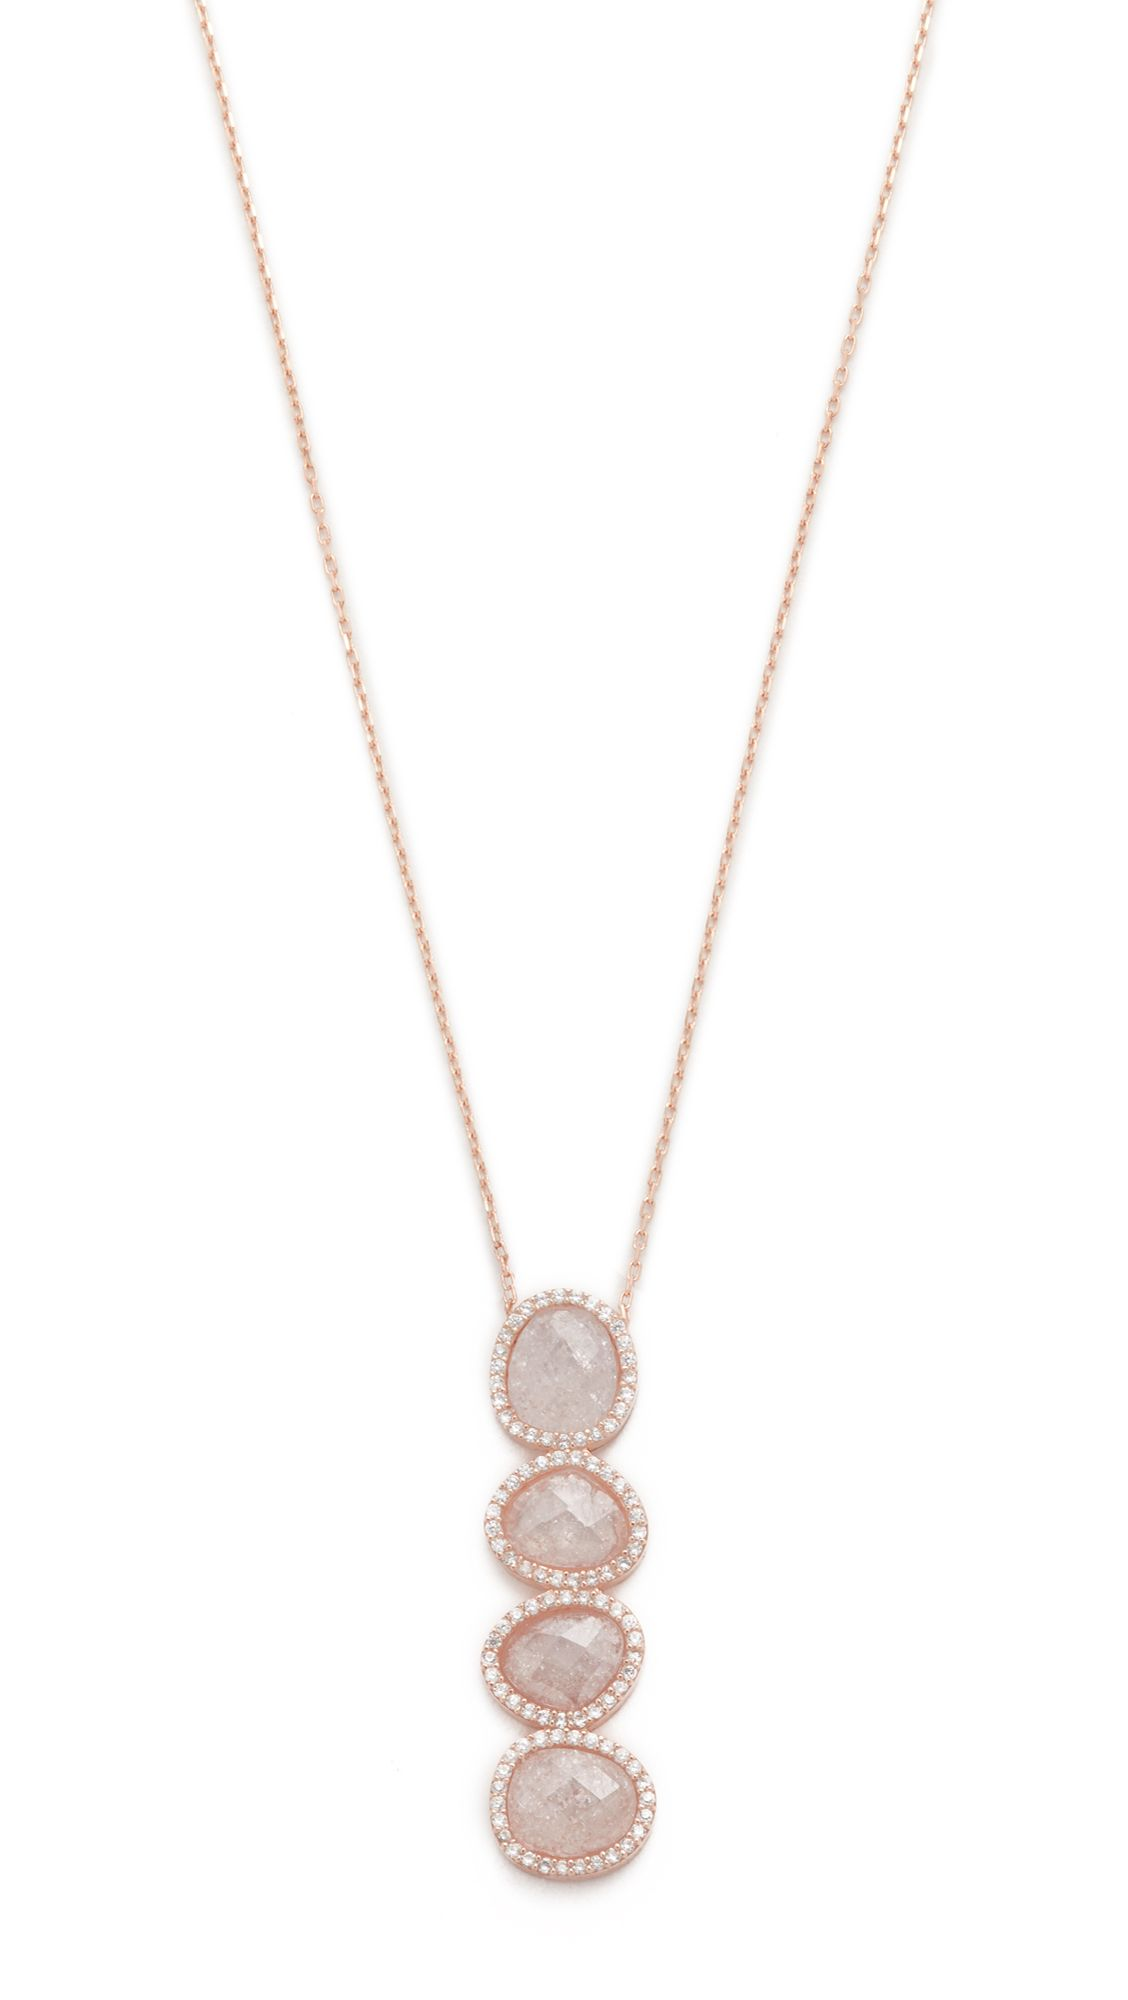 Crystal Moonstone Revelation Necklace